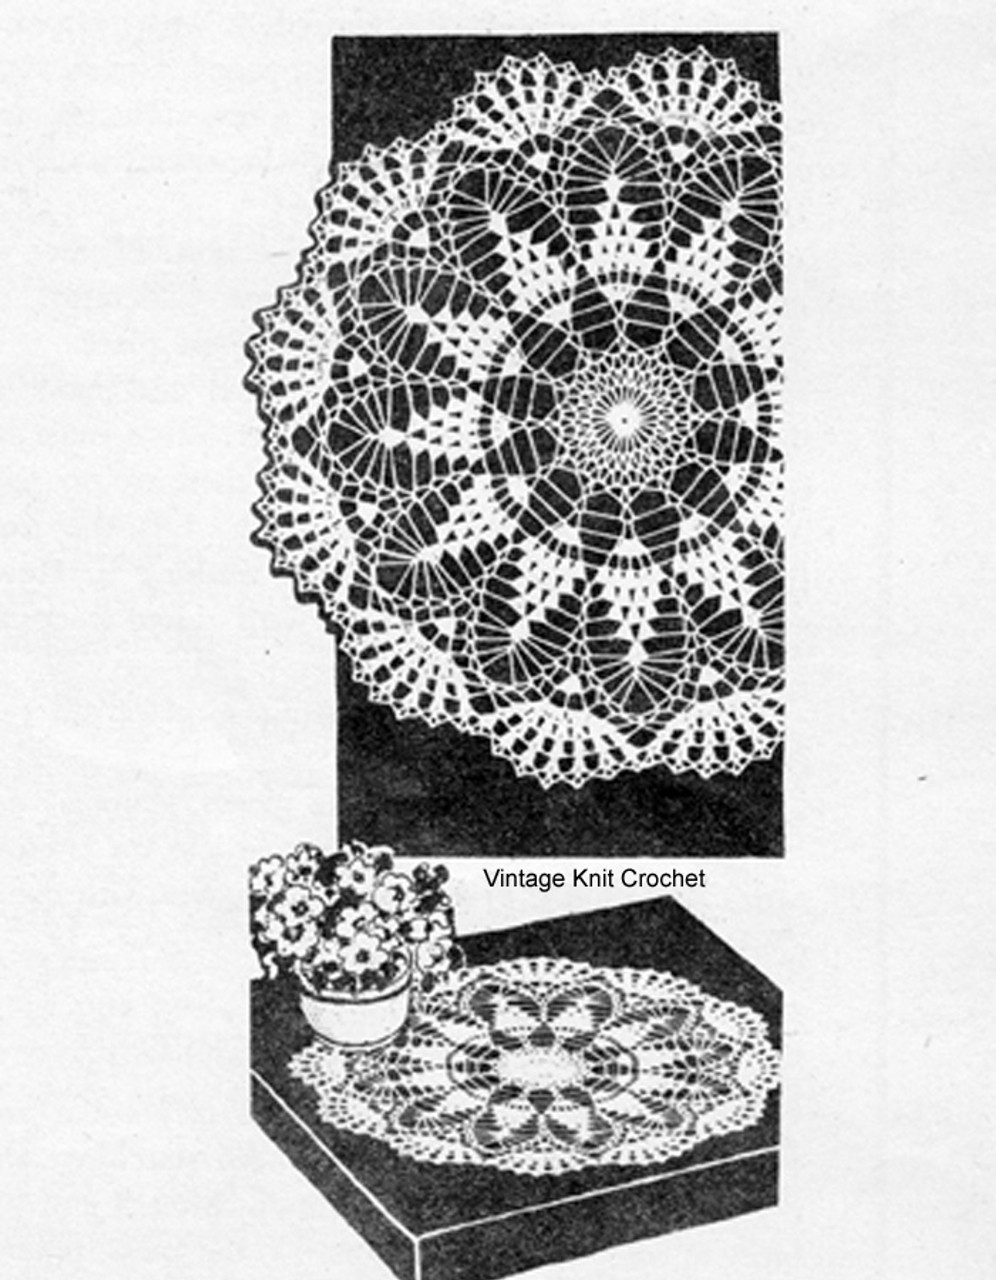 Mail Order 641, Large Crochet Pineapple Doily Pattern